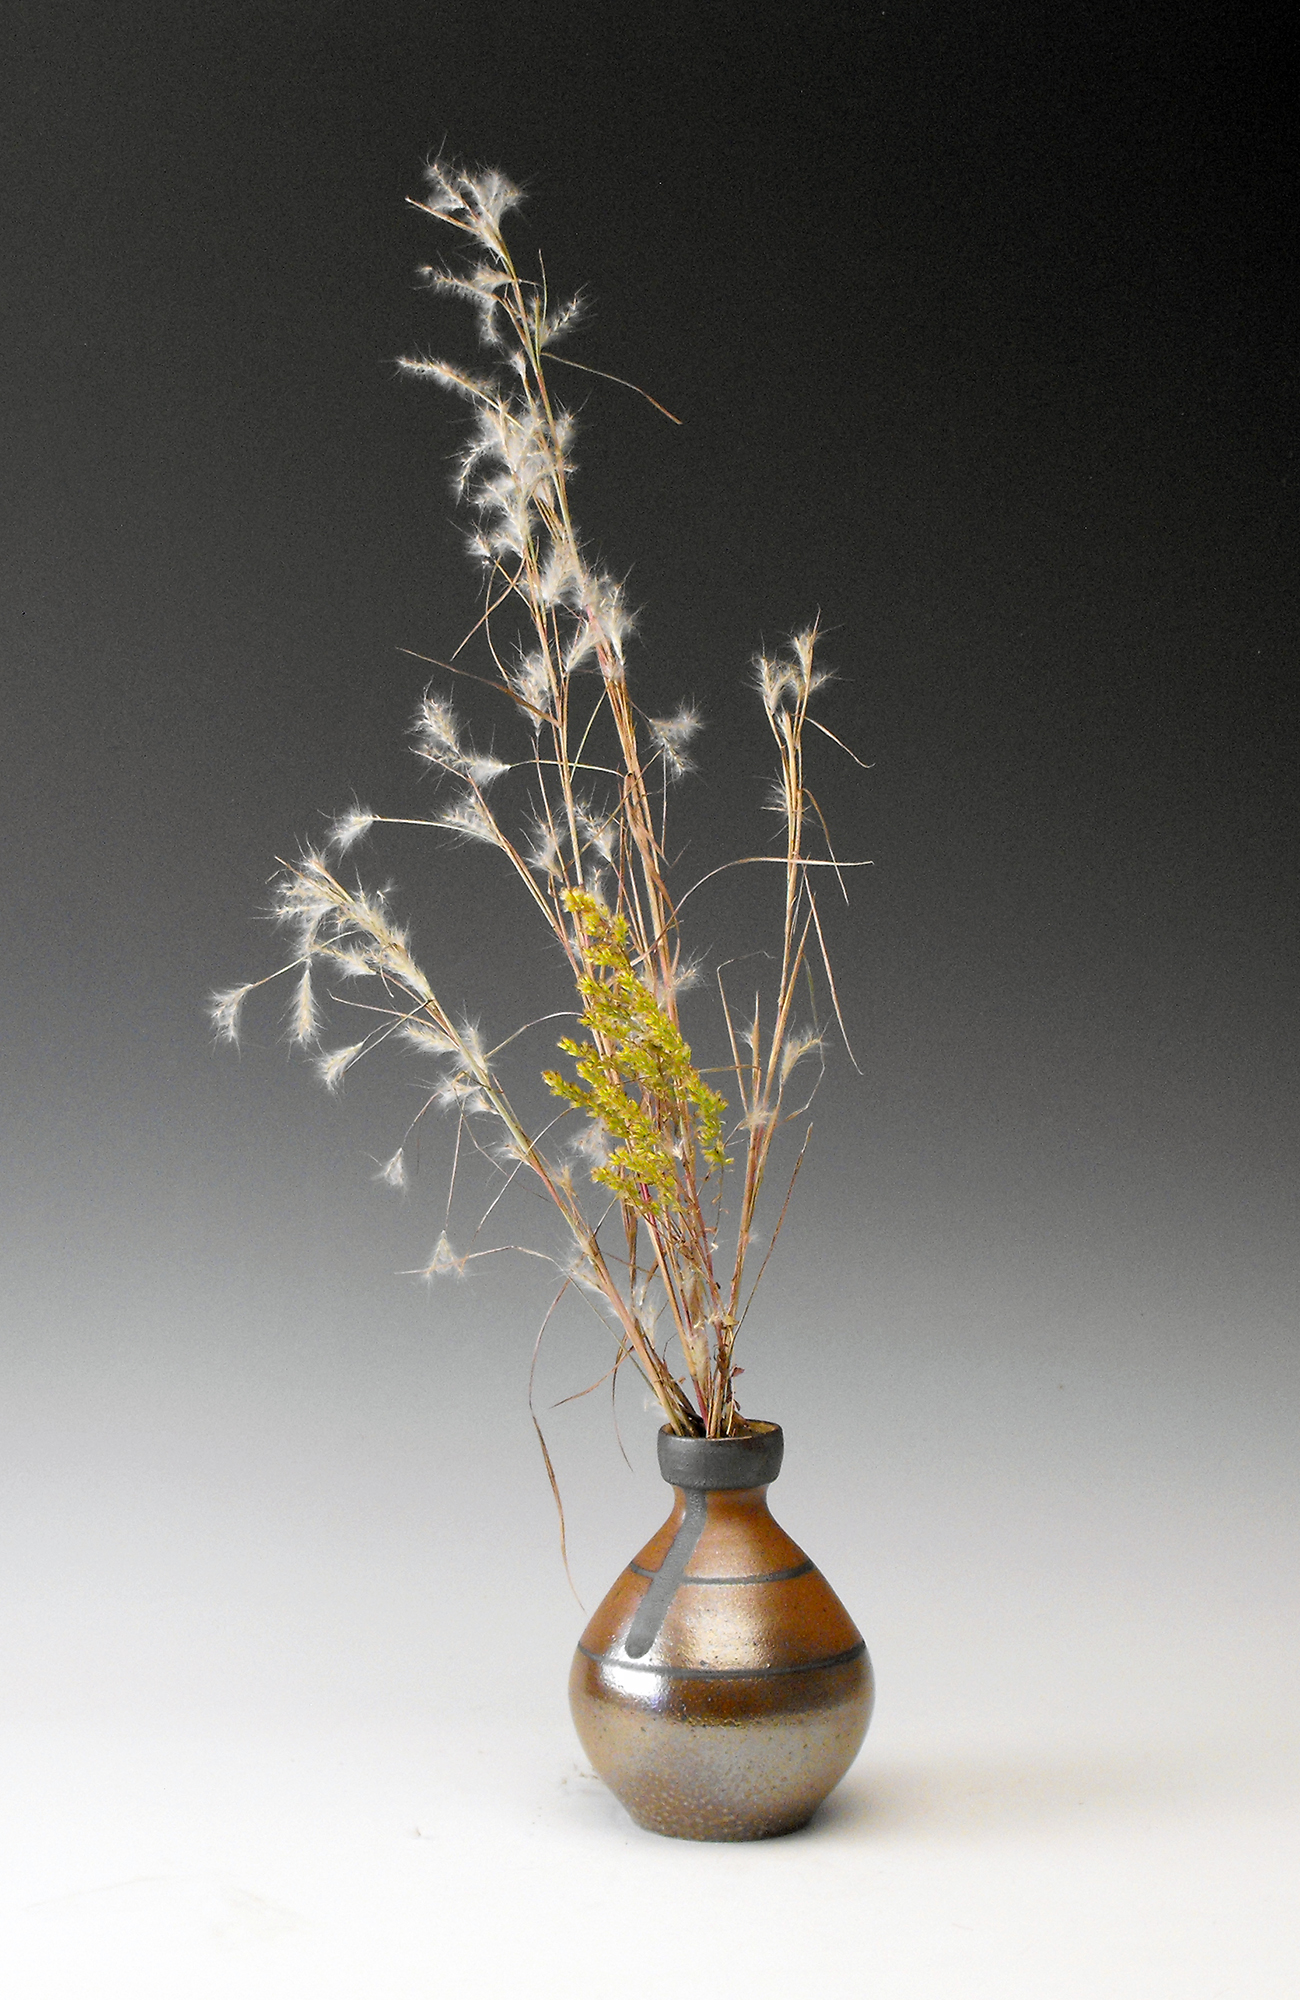 drip bottle with plants.jpg